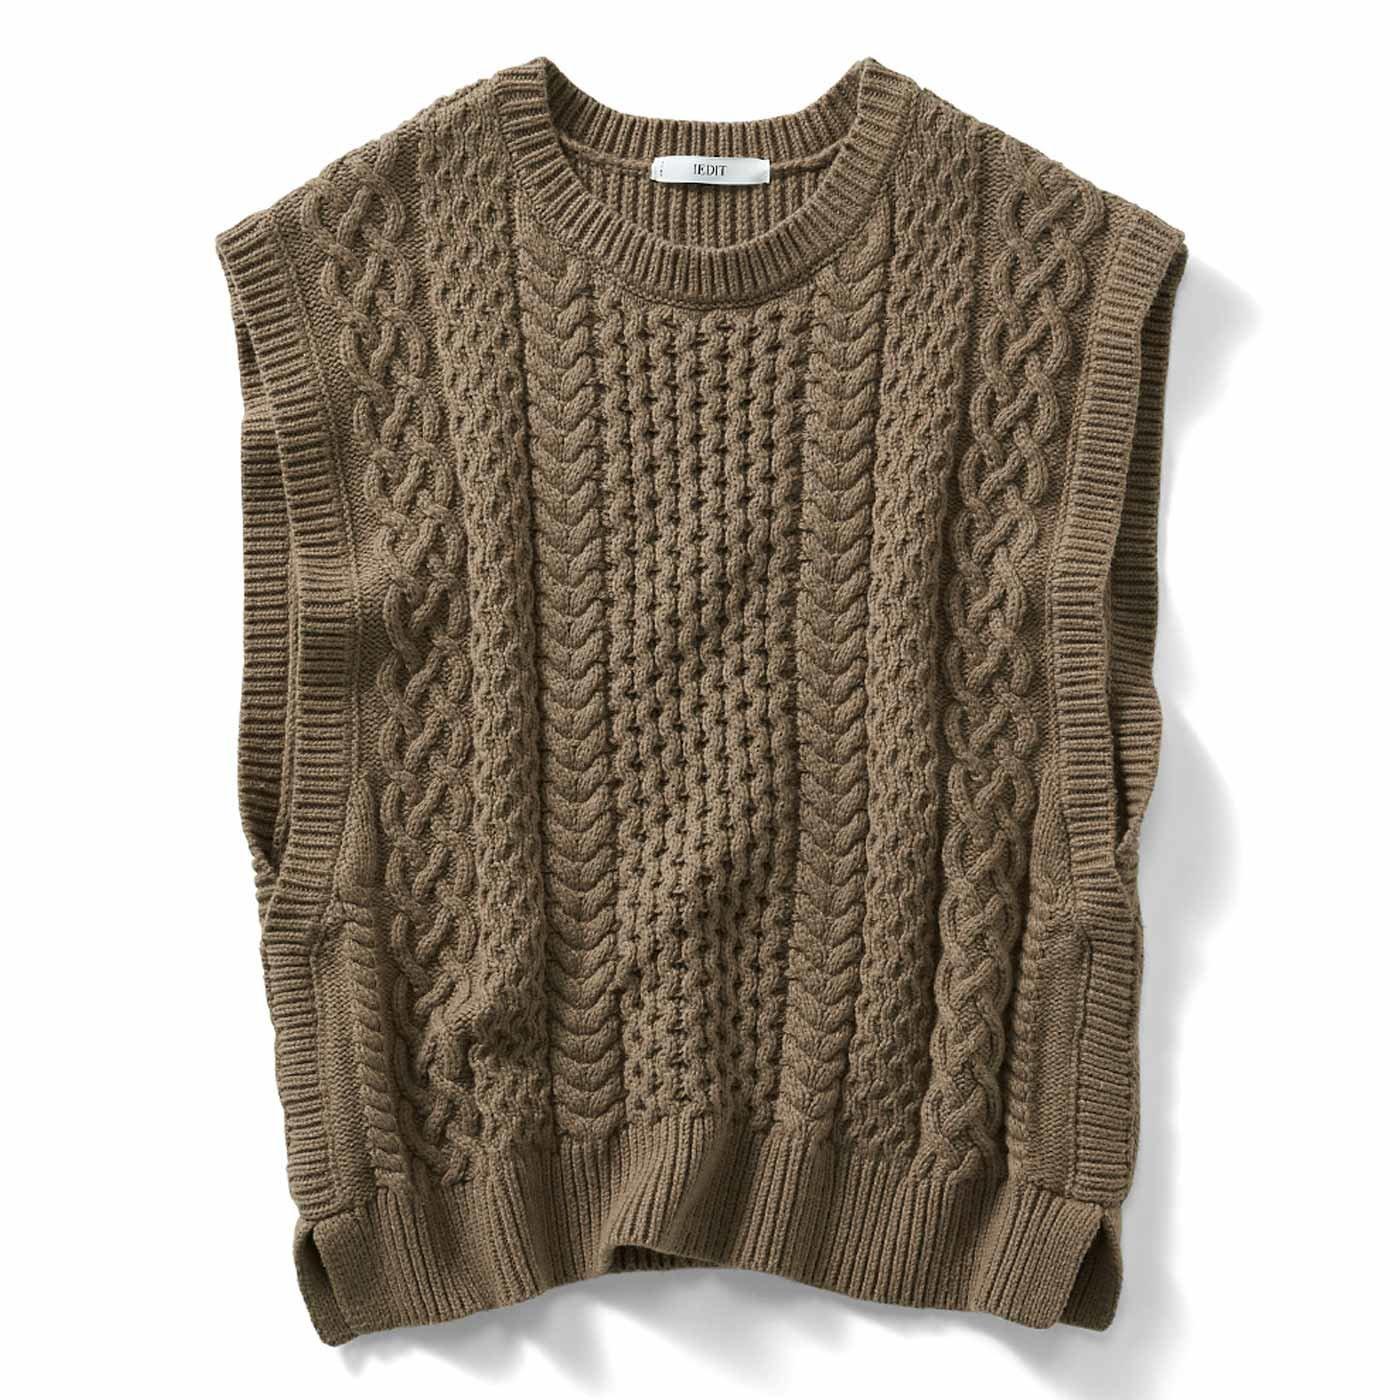 IEDIT[イディット] 小森美穂子さんとコラボ オンするだけで旬顔 こだわり素材の編み柄ニットベスト〈カーキブラウン〉